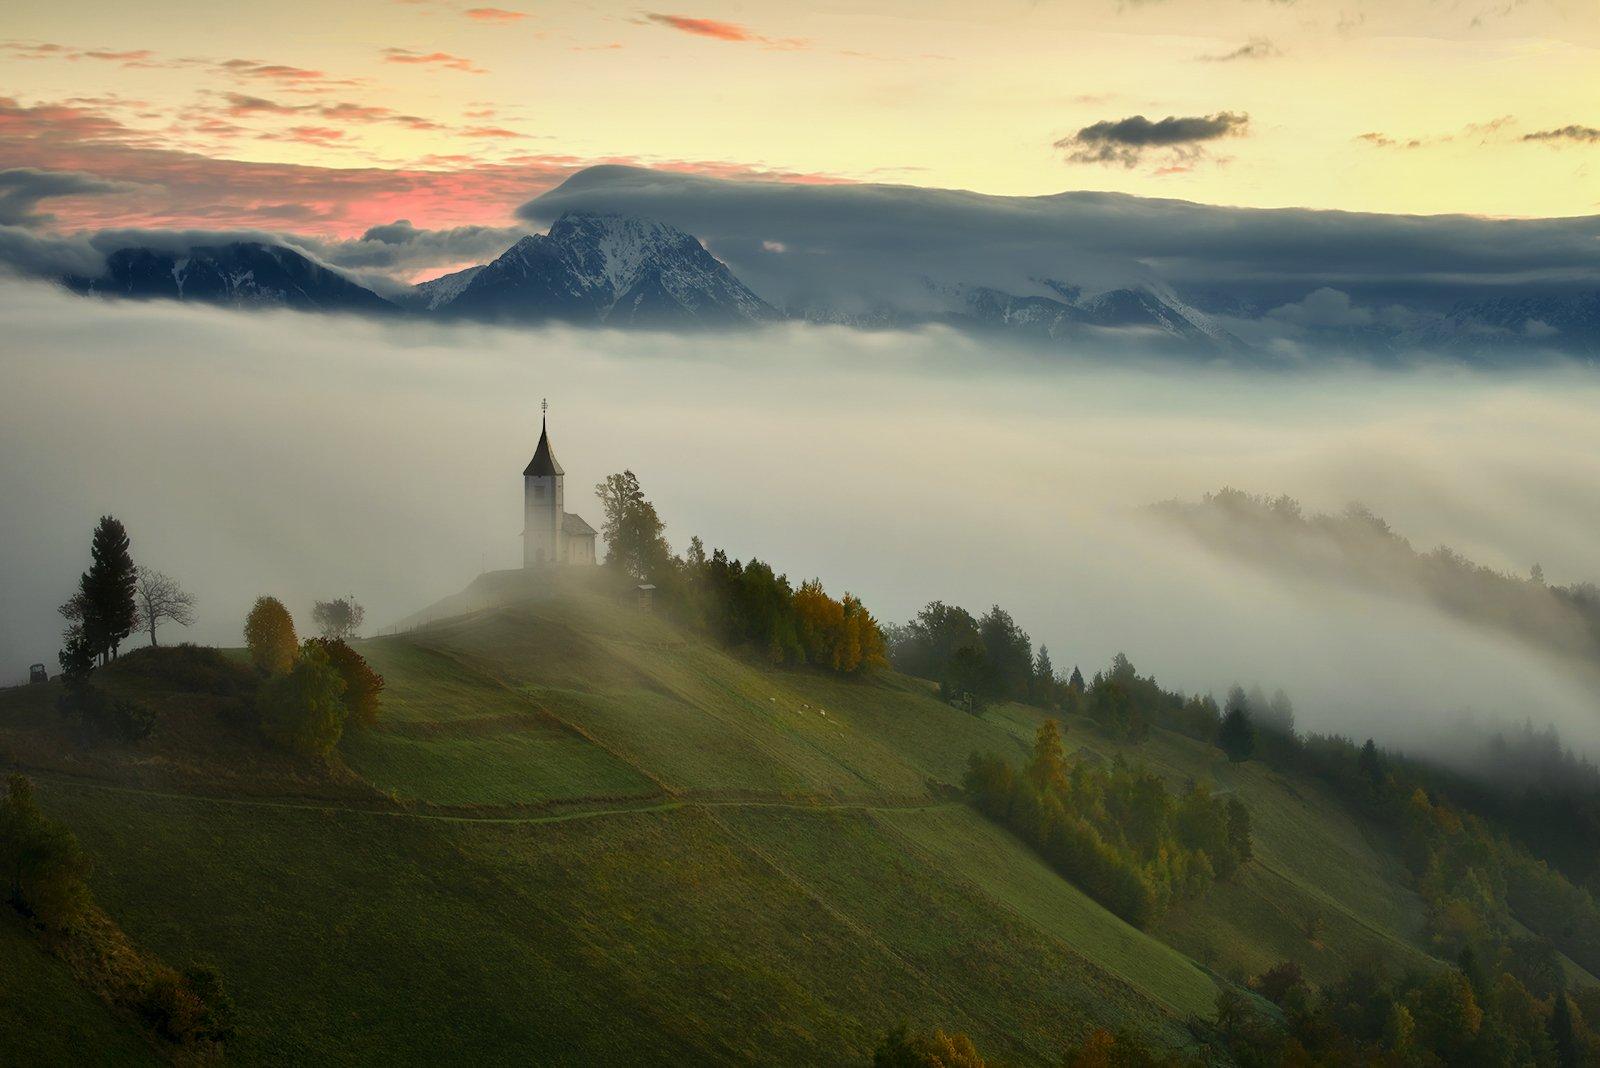 St. Primoz, church, Jamnik, dusk, alps, background, Slovenia, Jan Siemiński